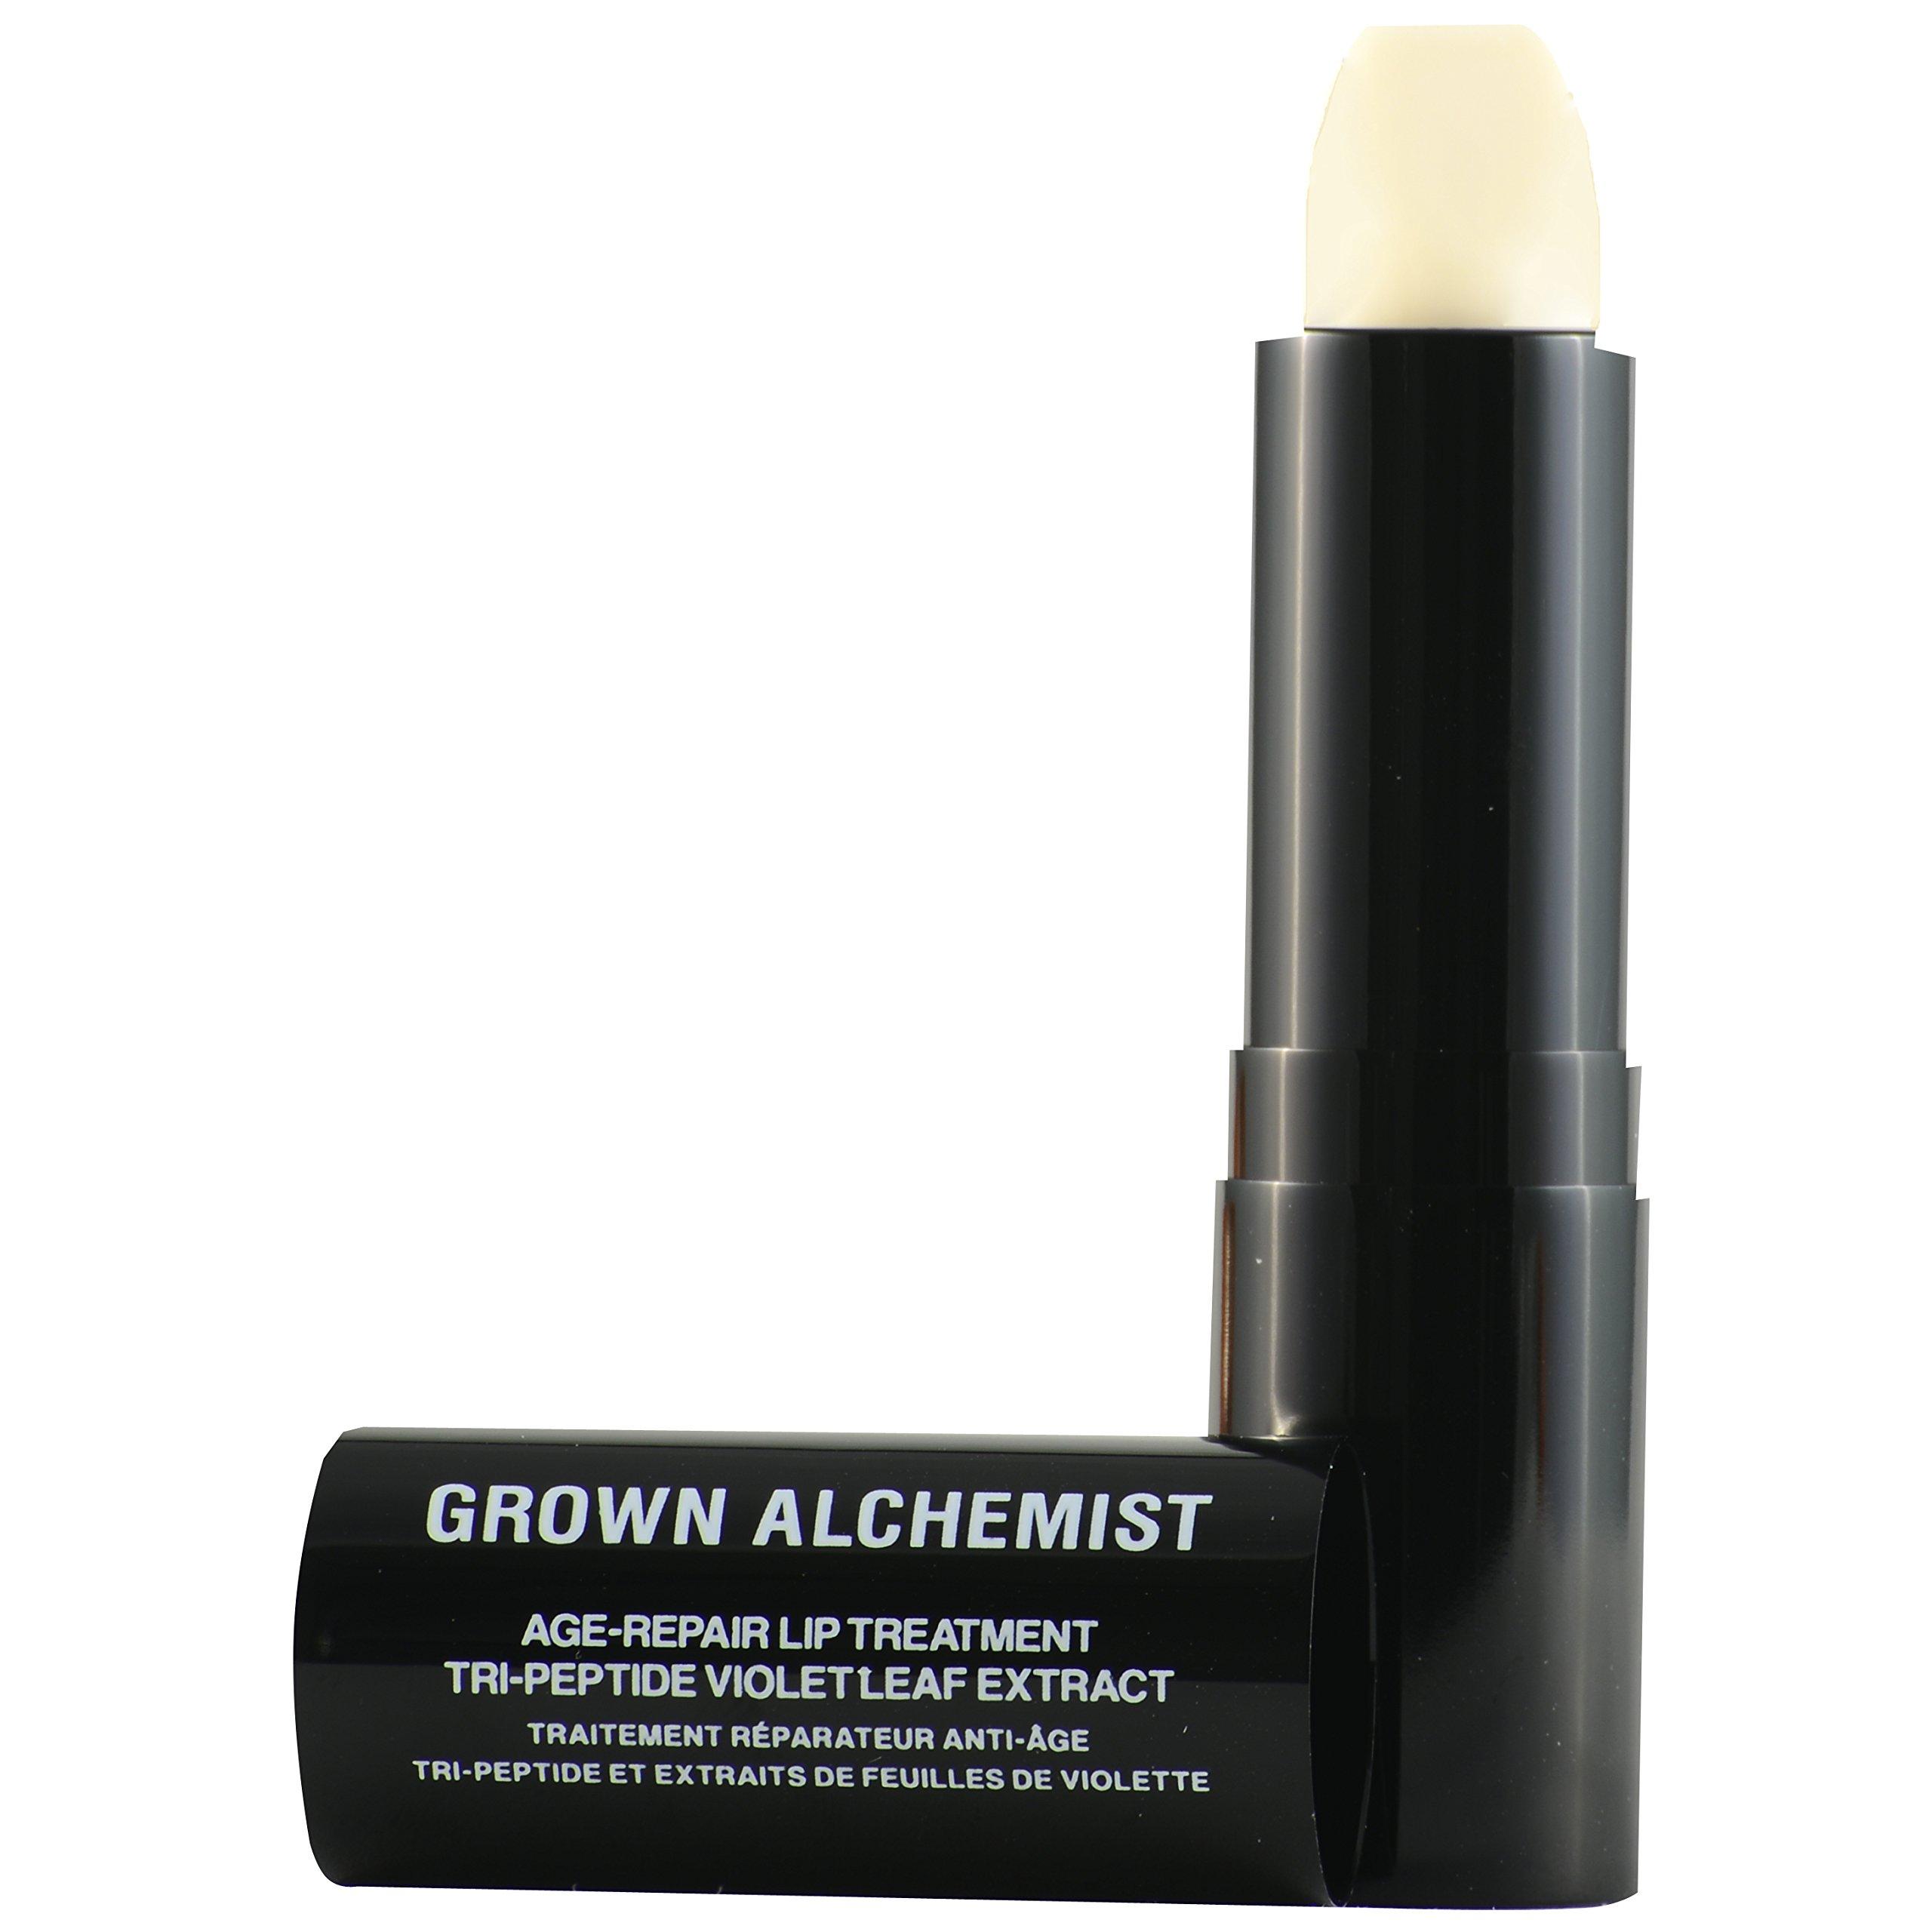 Grown Alchemist Age Repair Lip Treatment (3.8g / 0.14oz)